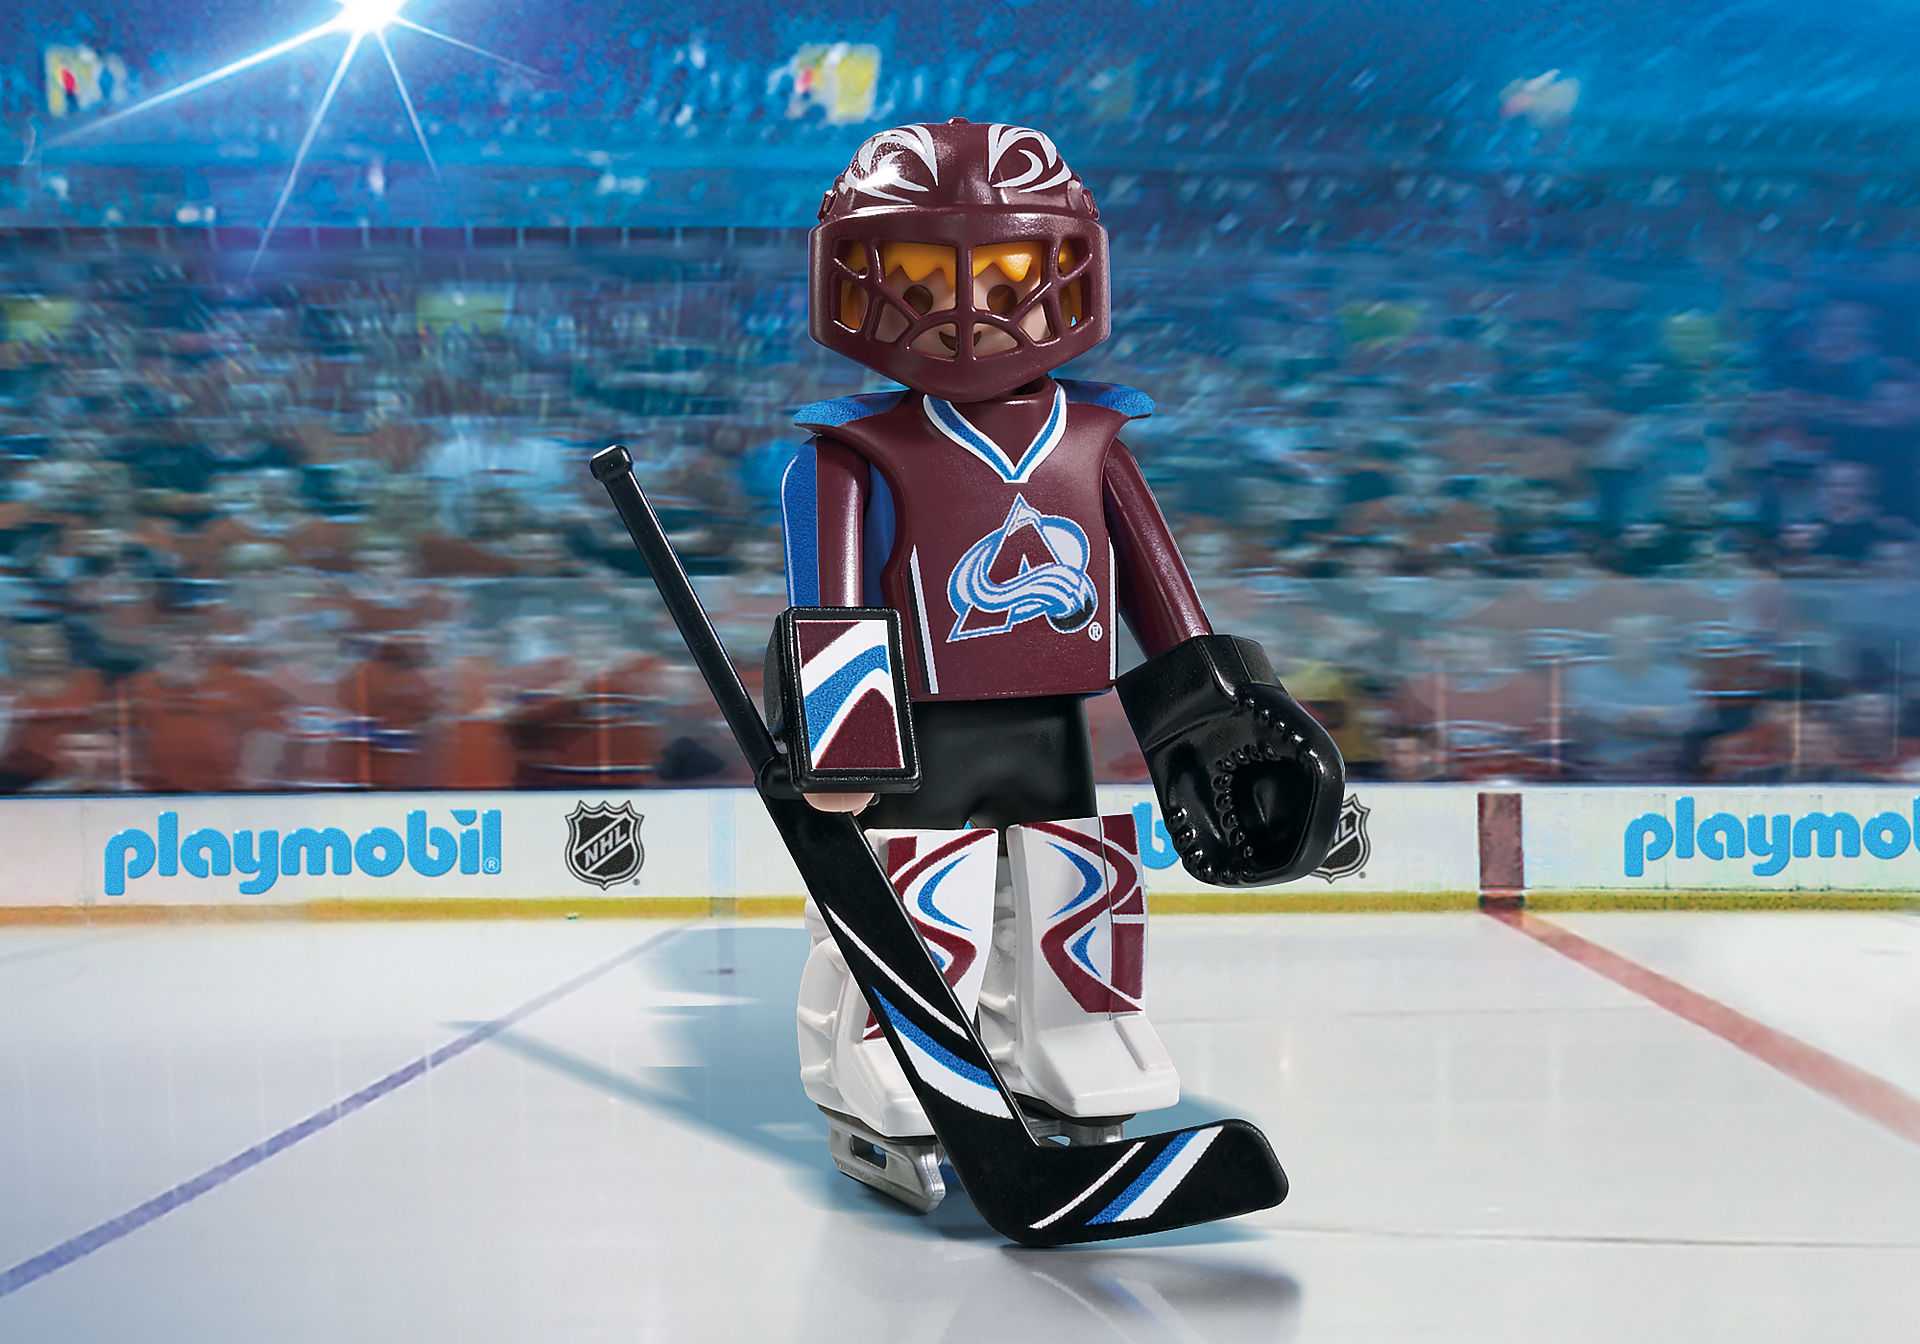 9189 NHL™ Colorado Avalanche™ Goalie zoom image1